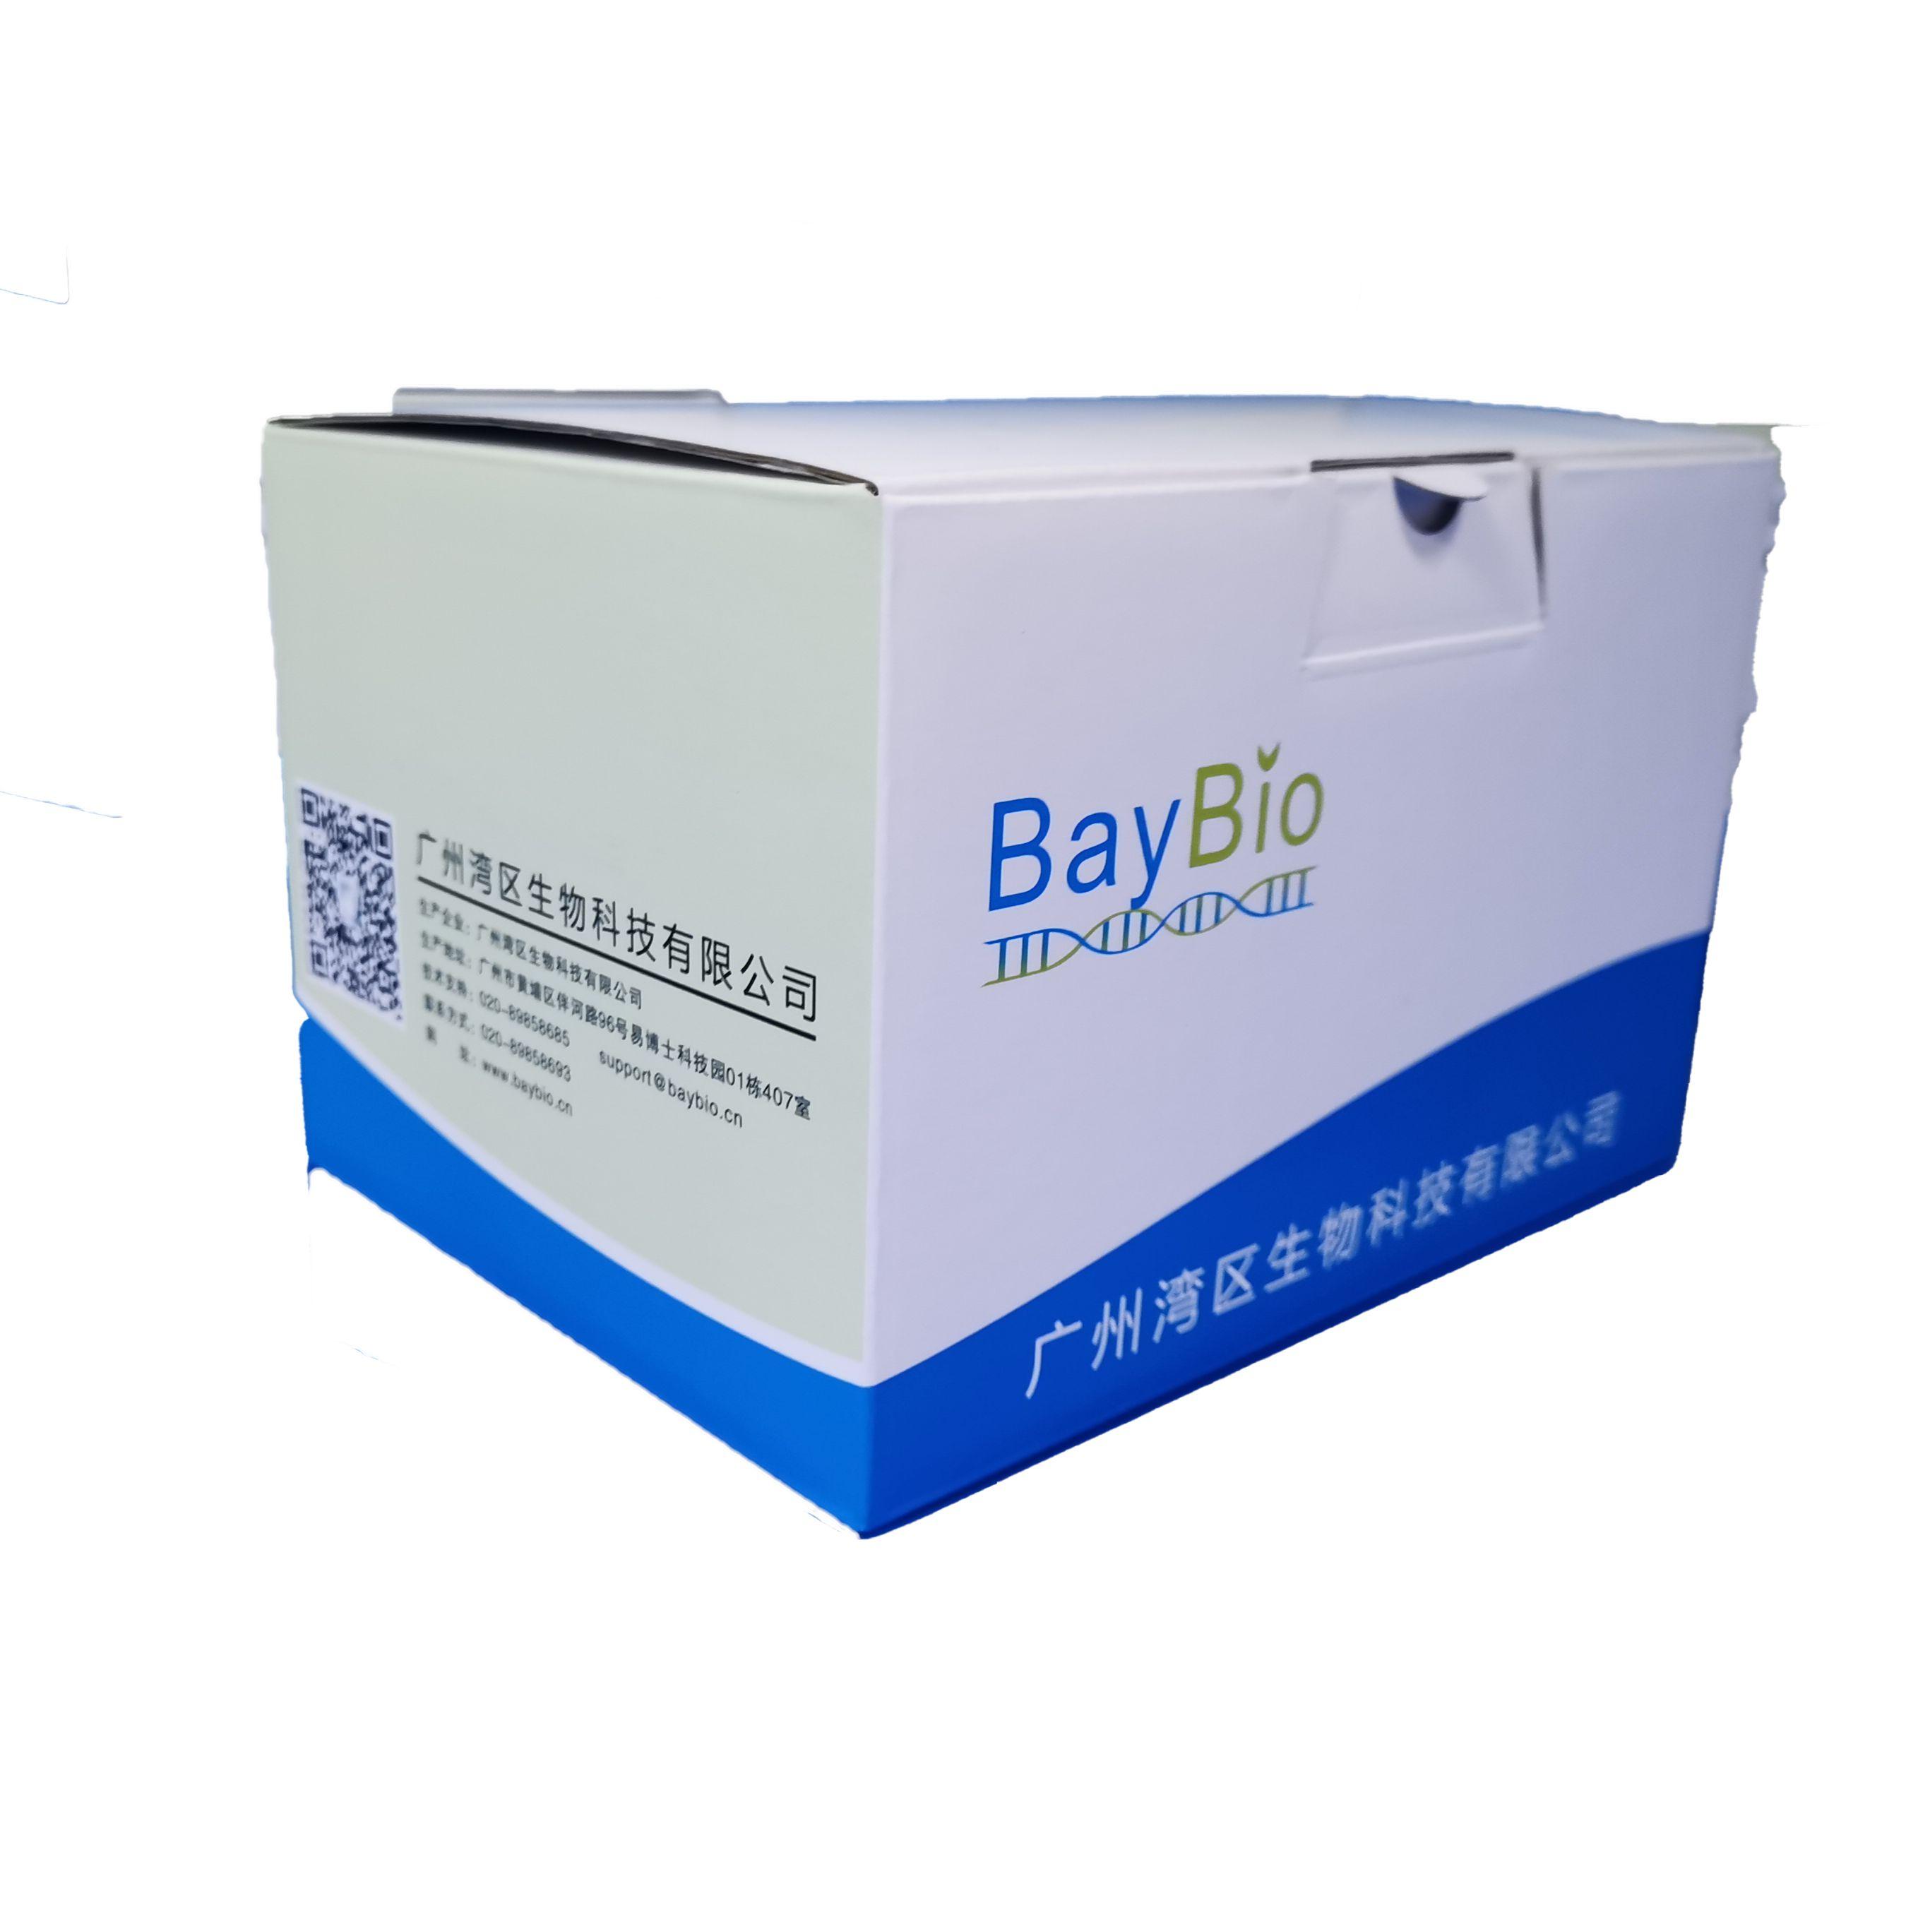 Baypure通用型磁珠法基因组DNA提取试剂盒